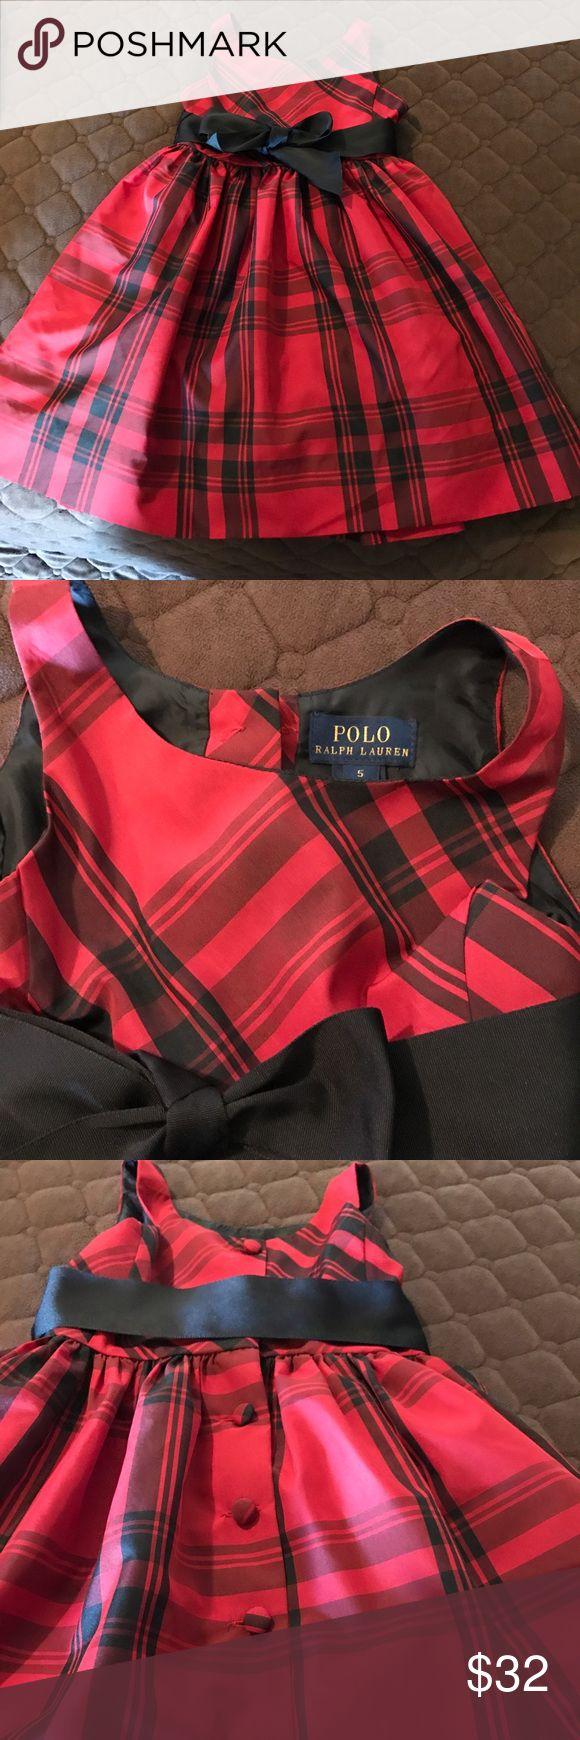 Polo Ralph Lauren dress | My Posh Closet